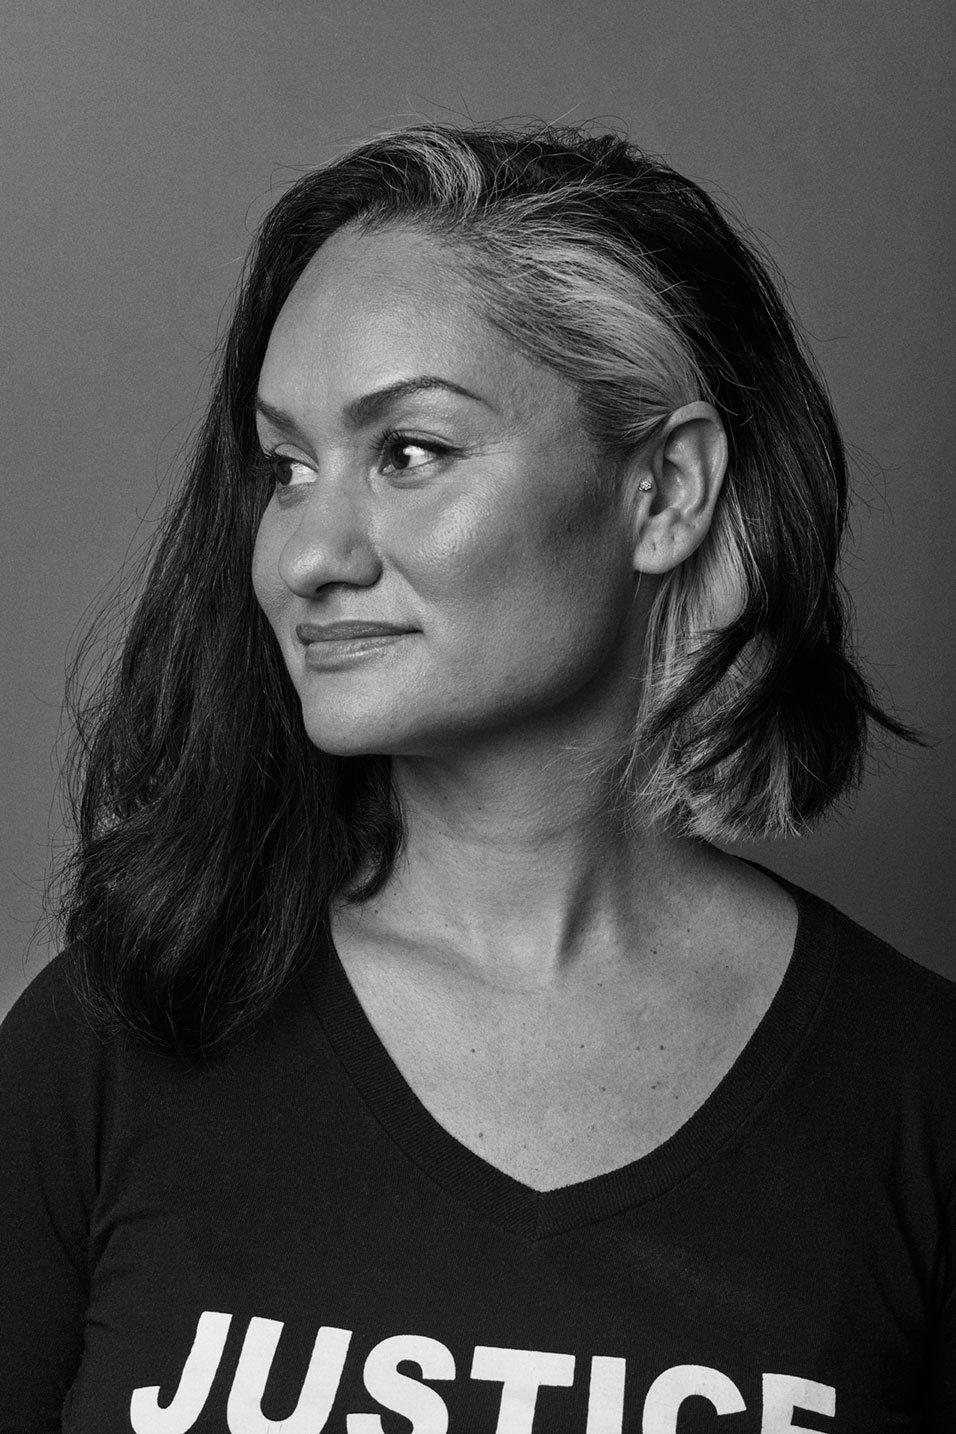 Portrait of Carmen Perez, Woman's March organizer and activist for Romance Journal Issue 02 Resistance. Publication design, art direction, print design, interviews by RoAndCo.